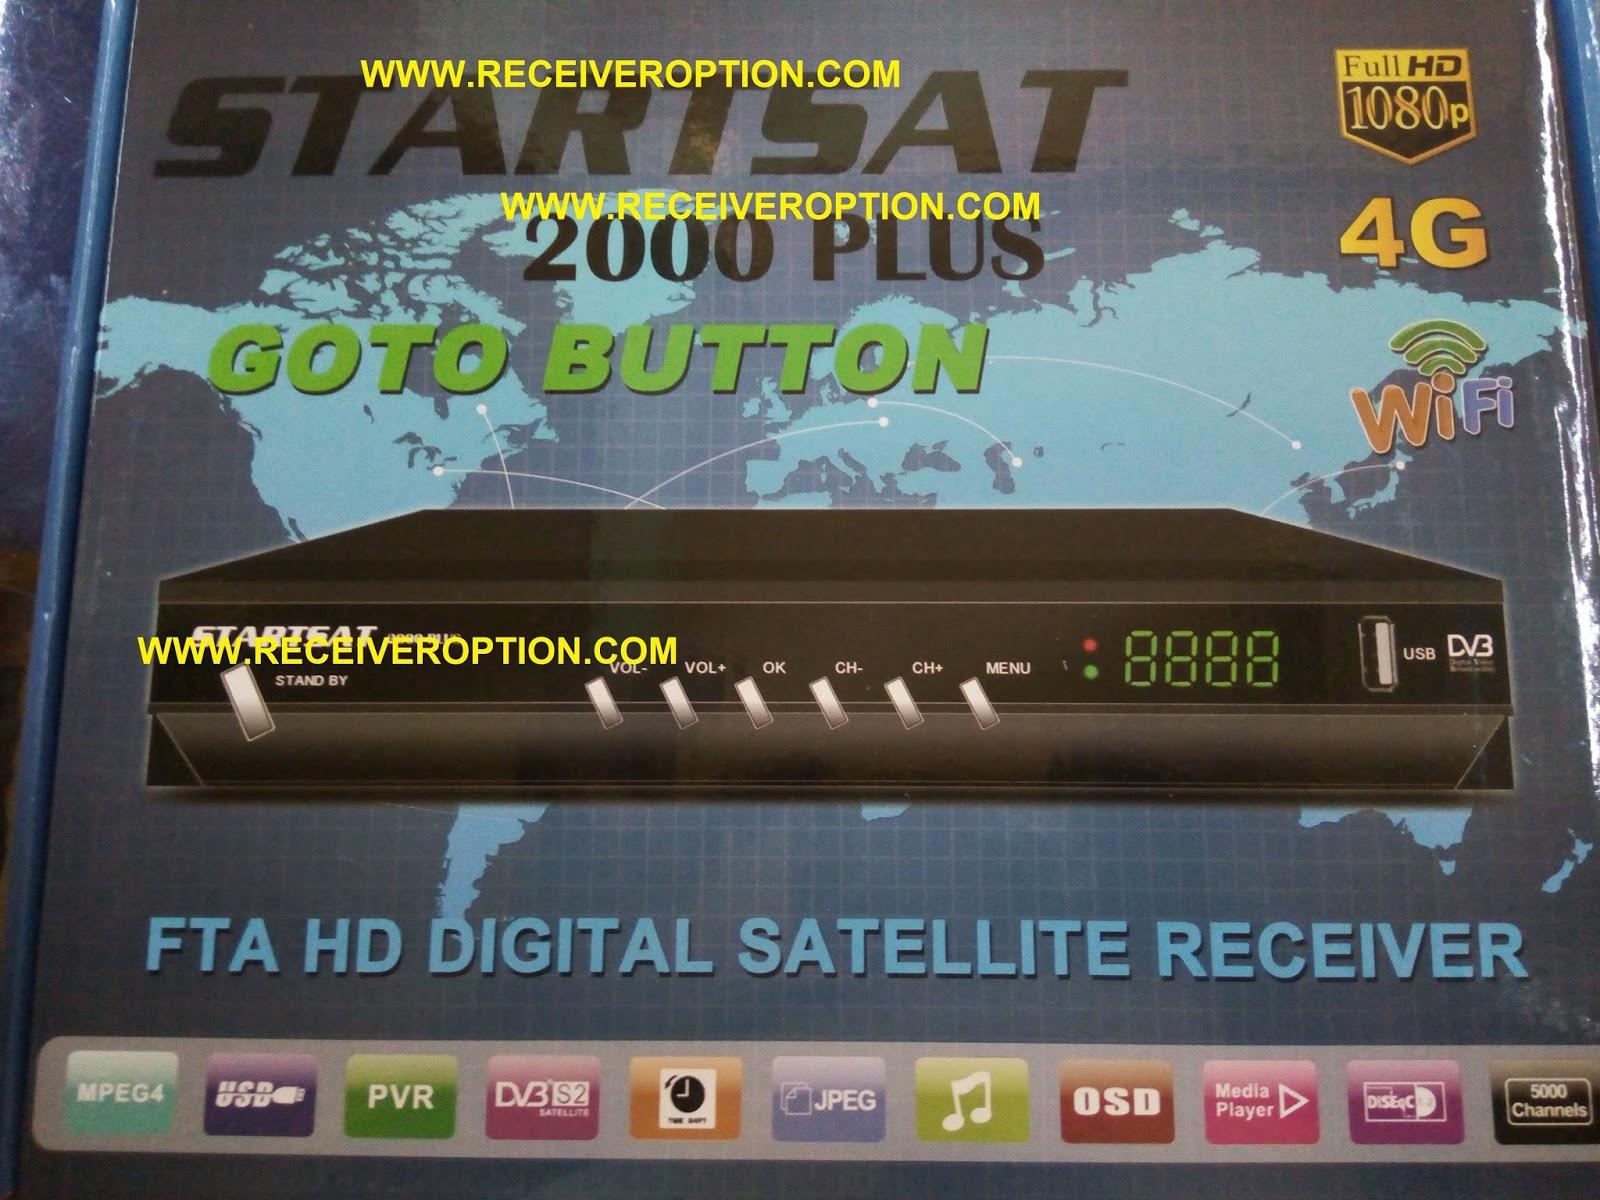 150d Plus Receiver Software Starsat - singleswool's blog